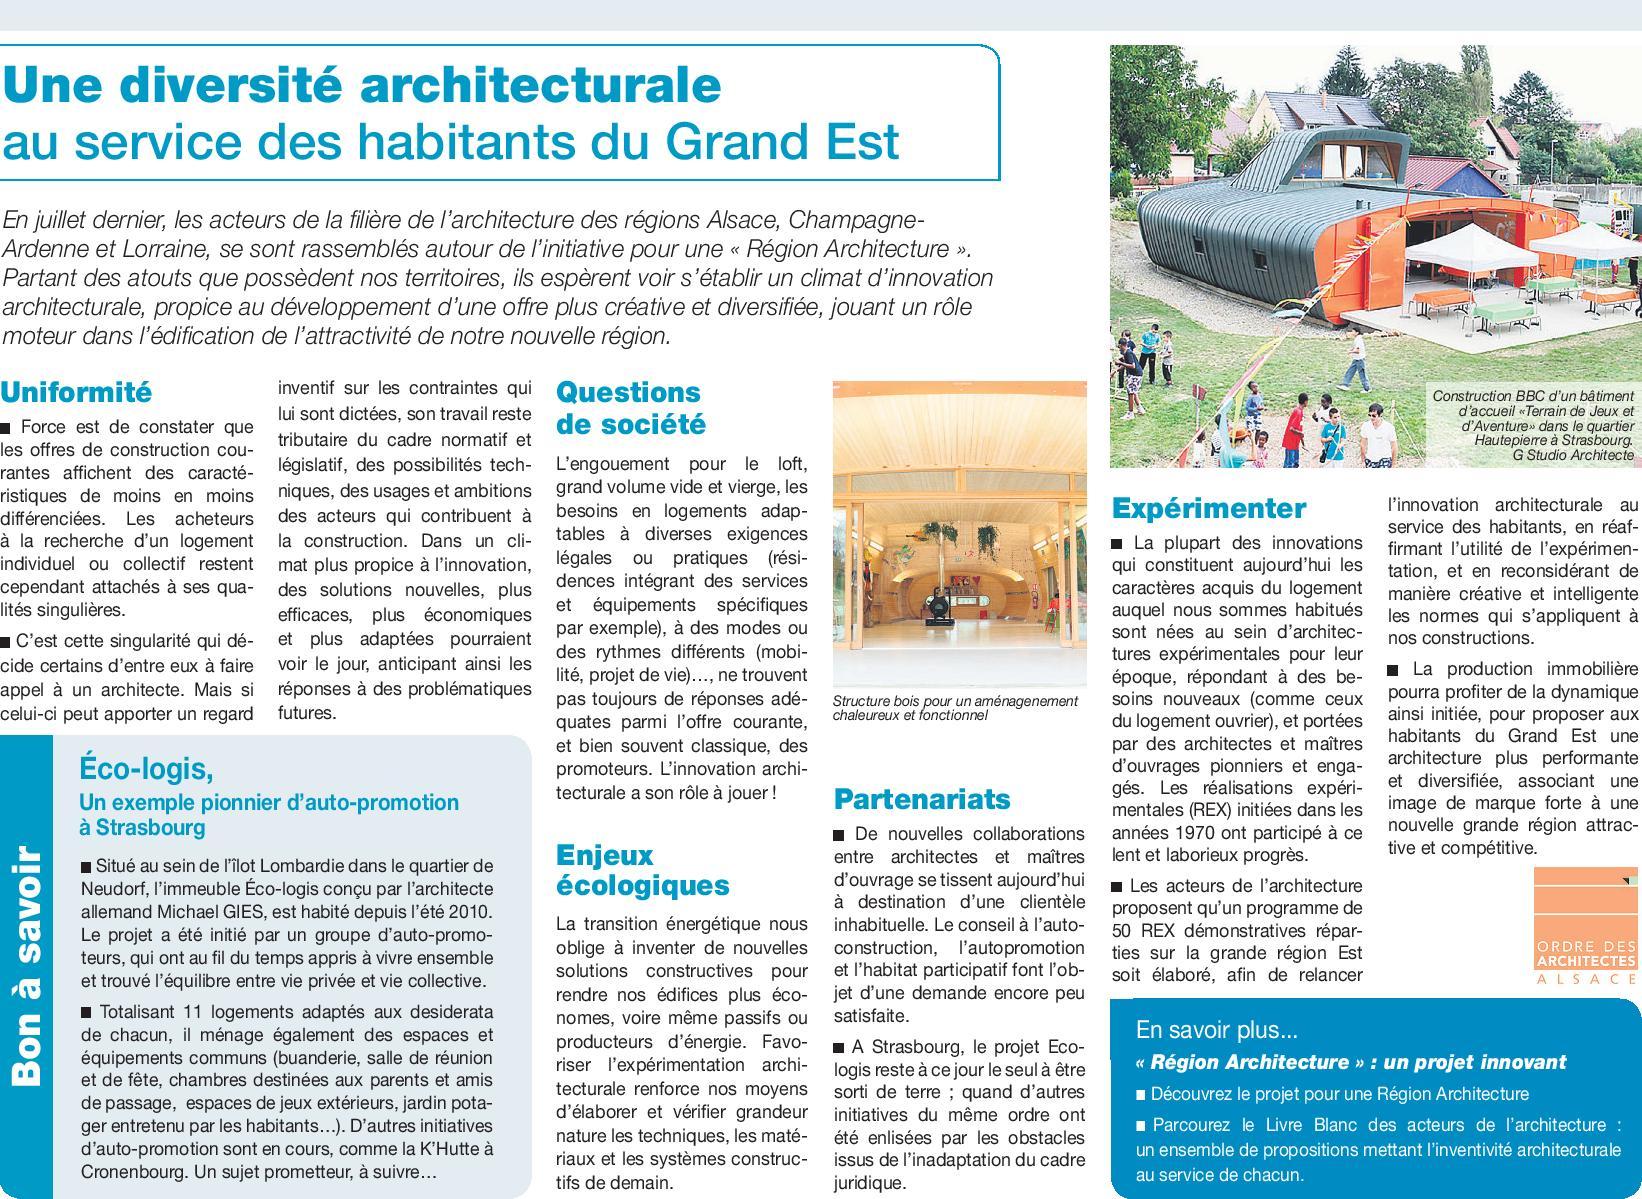 diversite_architecturale-page-001.jpg